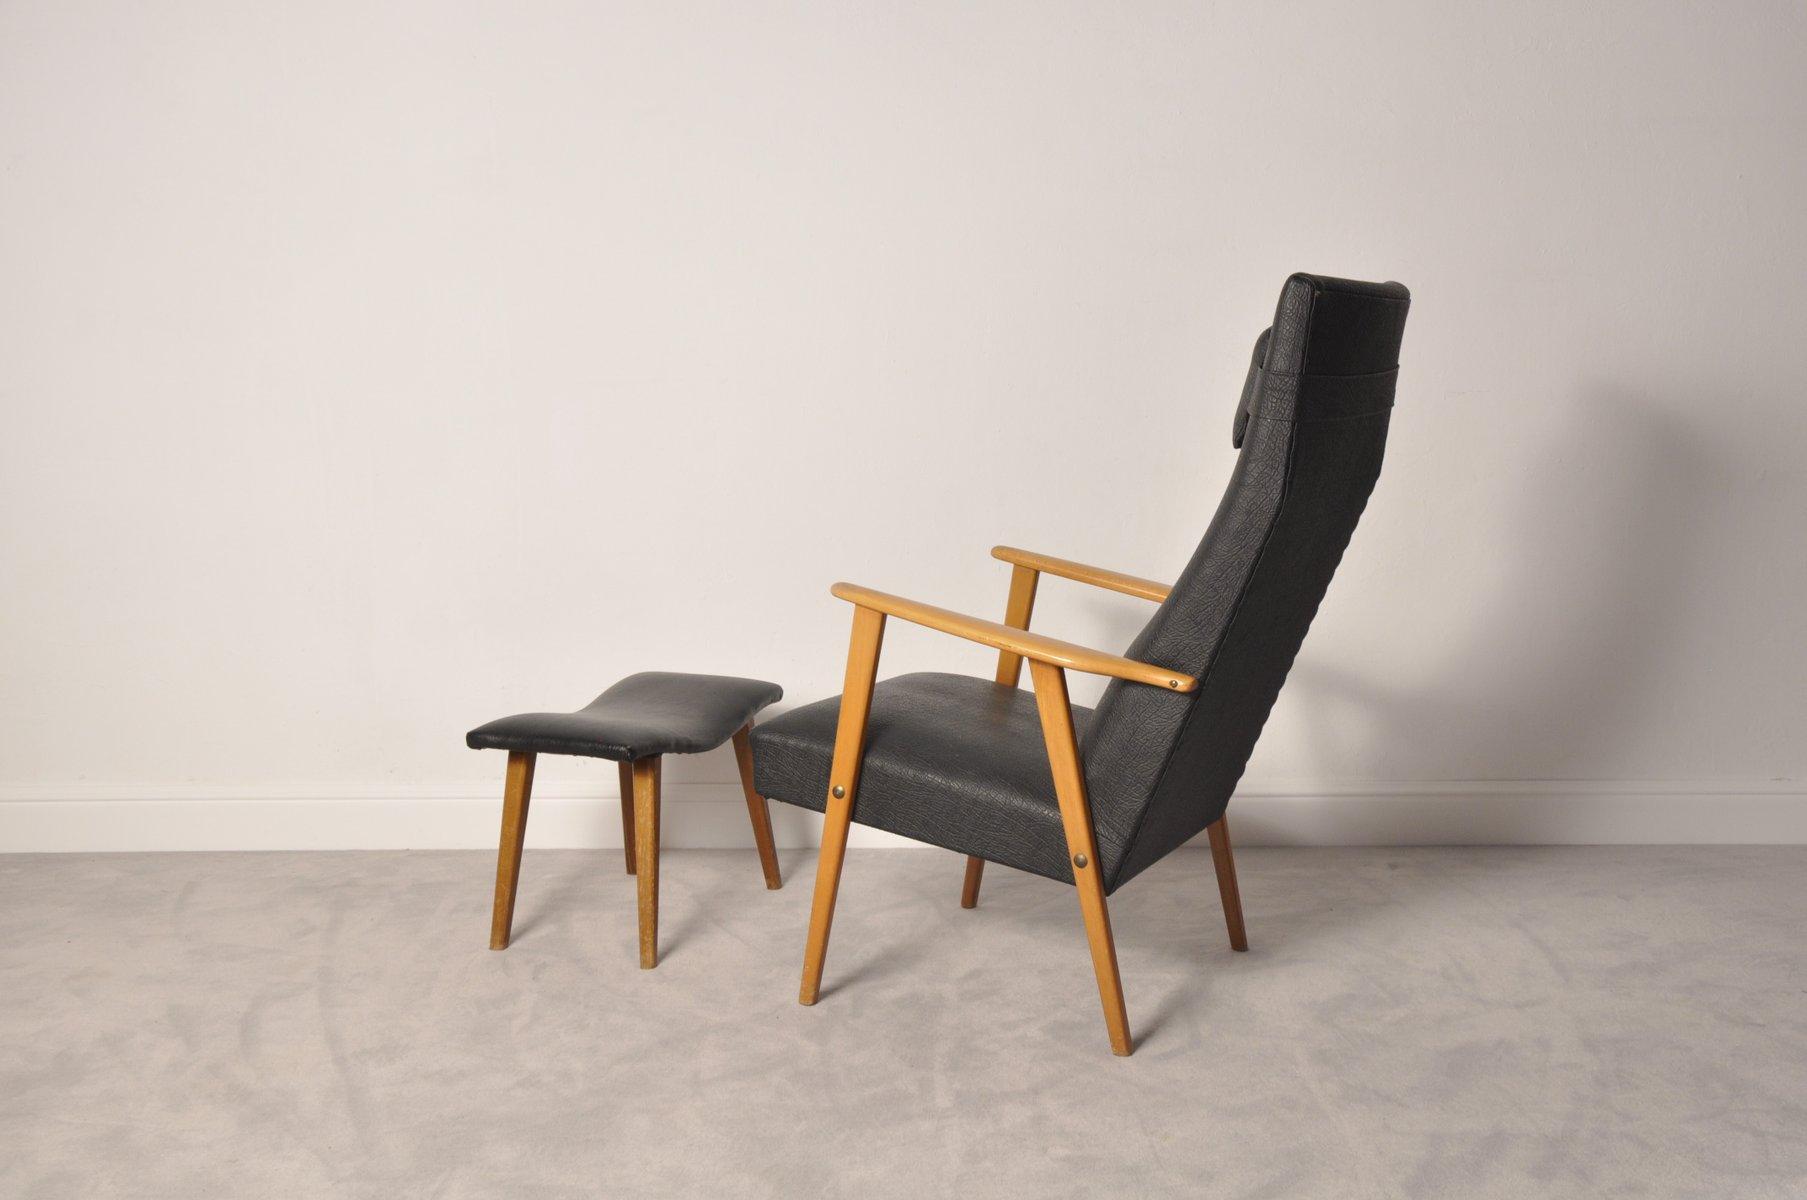 Mid century modern high back chair and ottoman 1950s for sale at pamono - Mid century modern chair and ottoman ...